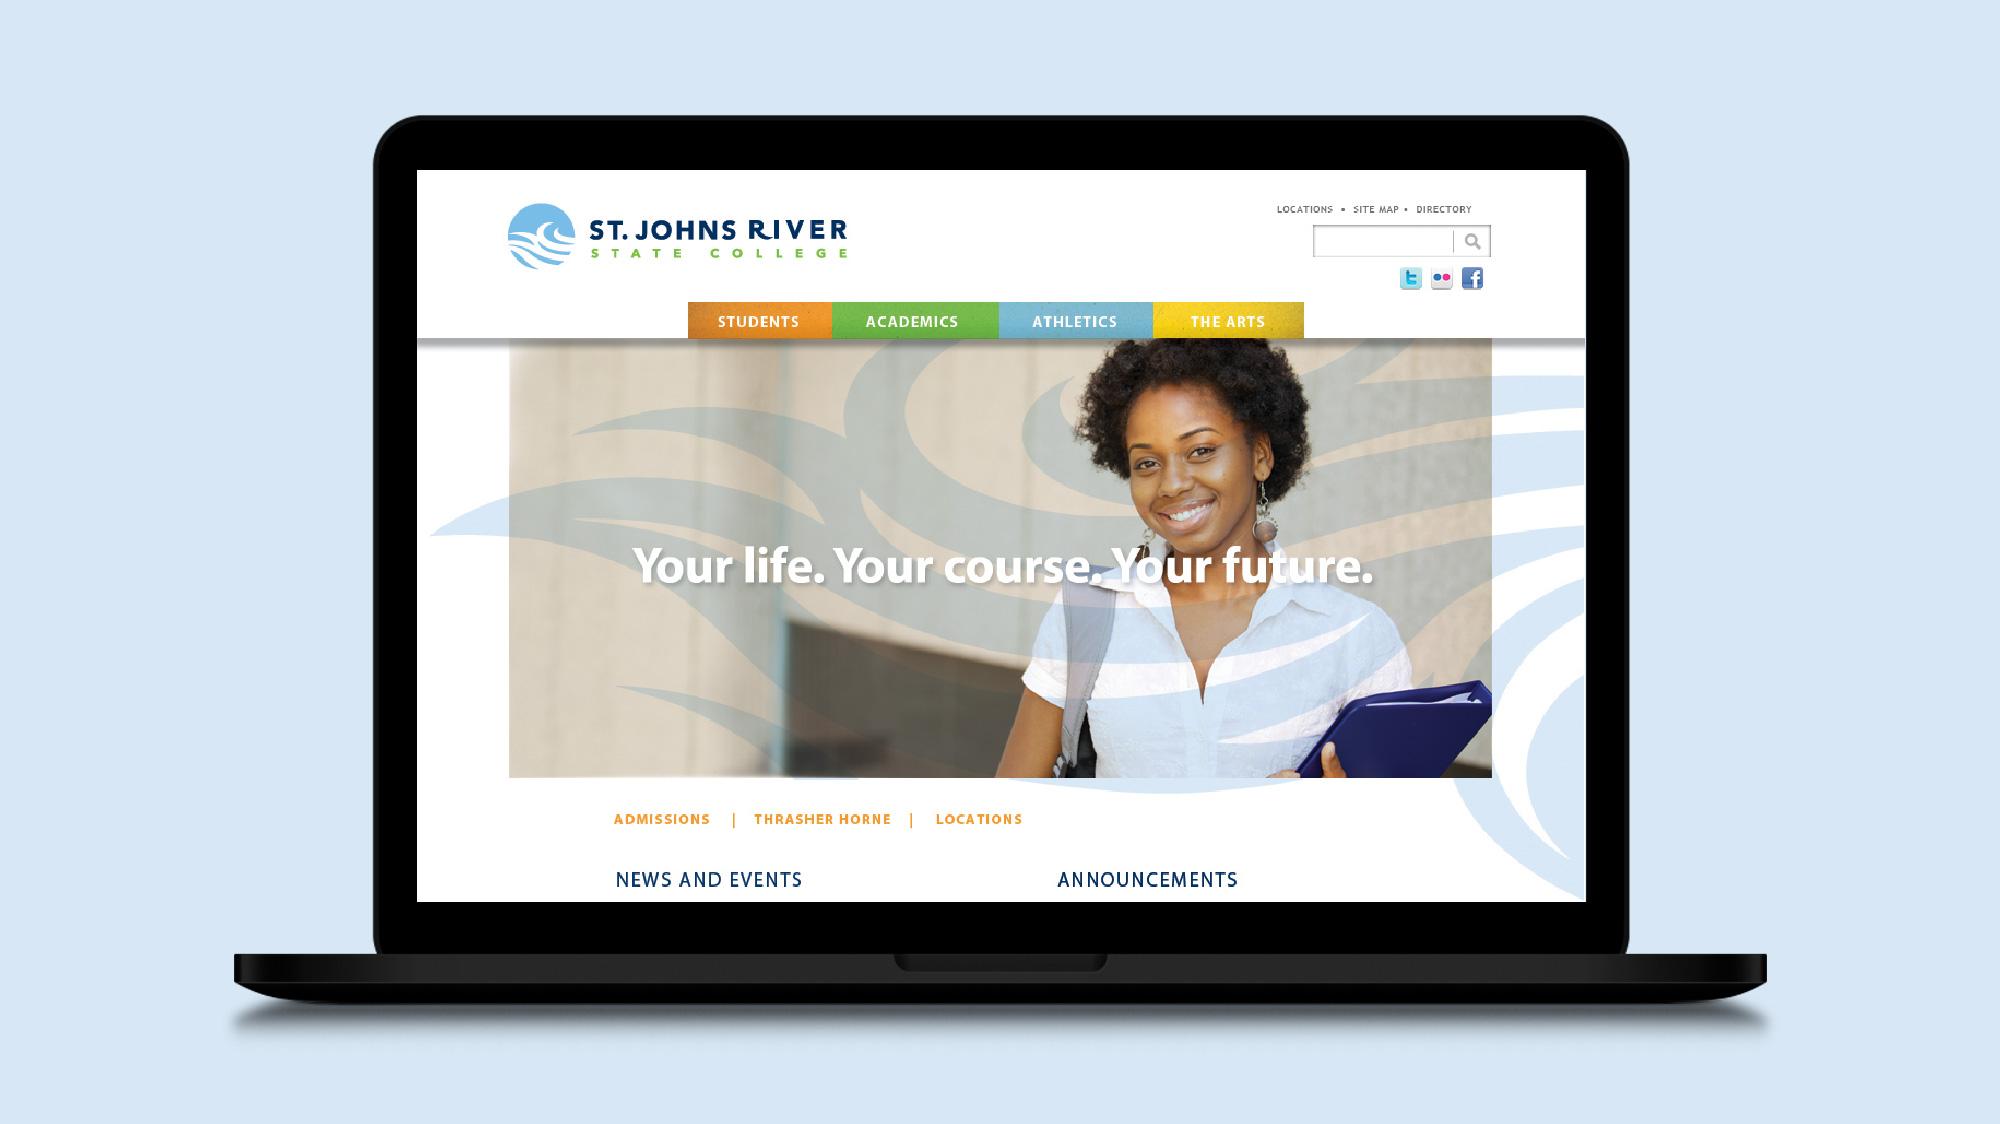 Web-Based Educational Programming